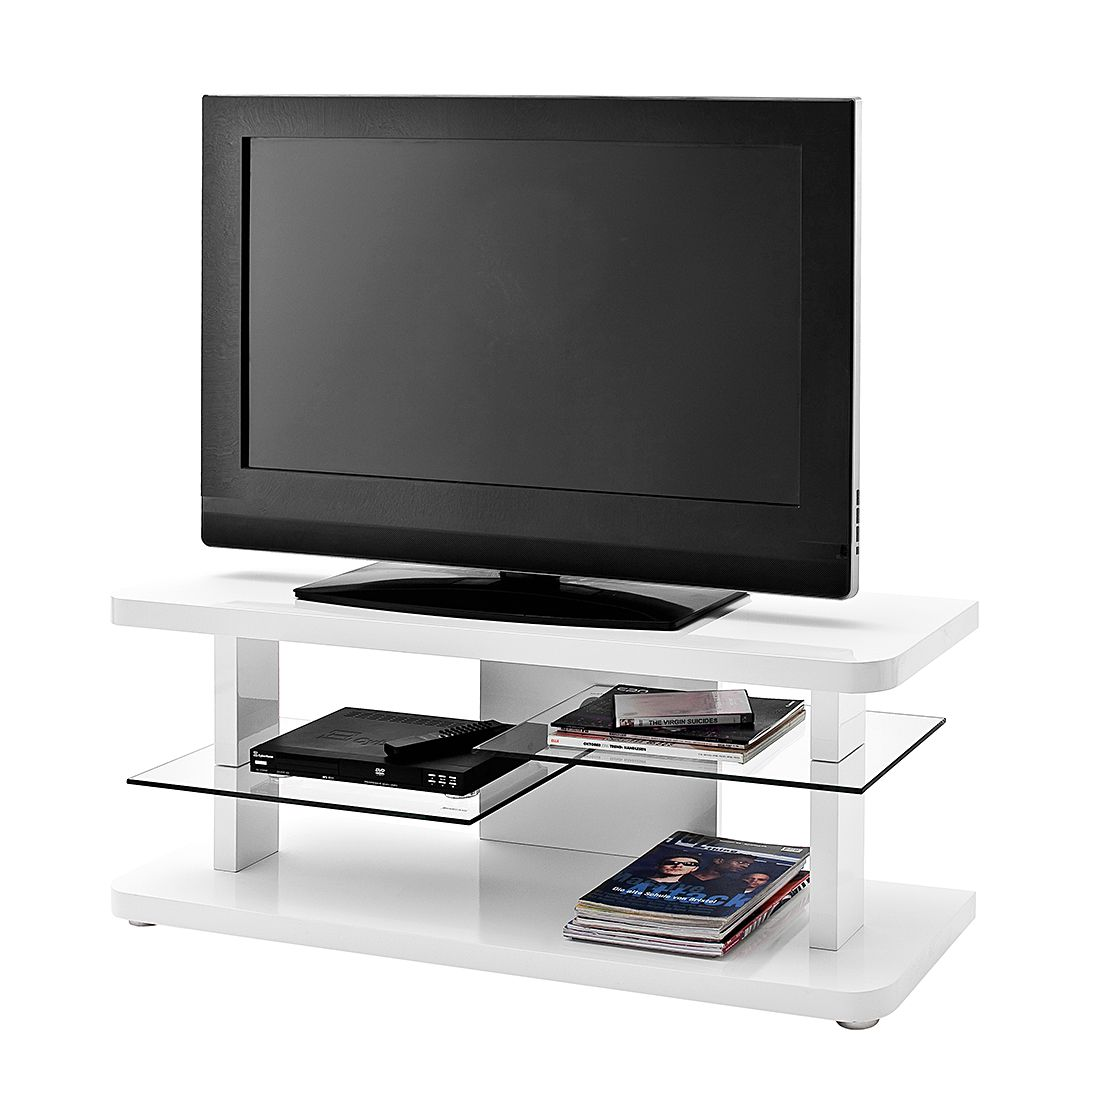 Meuble verre guide d 39 achat for Meuble tv blanc 110 cm